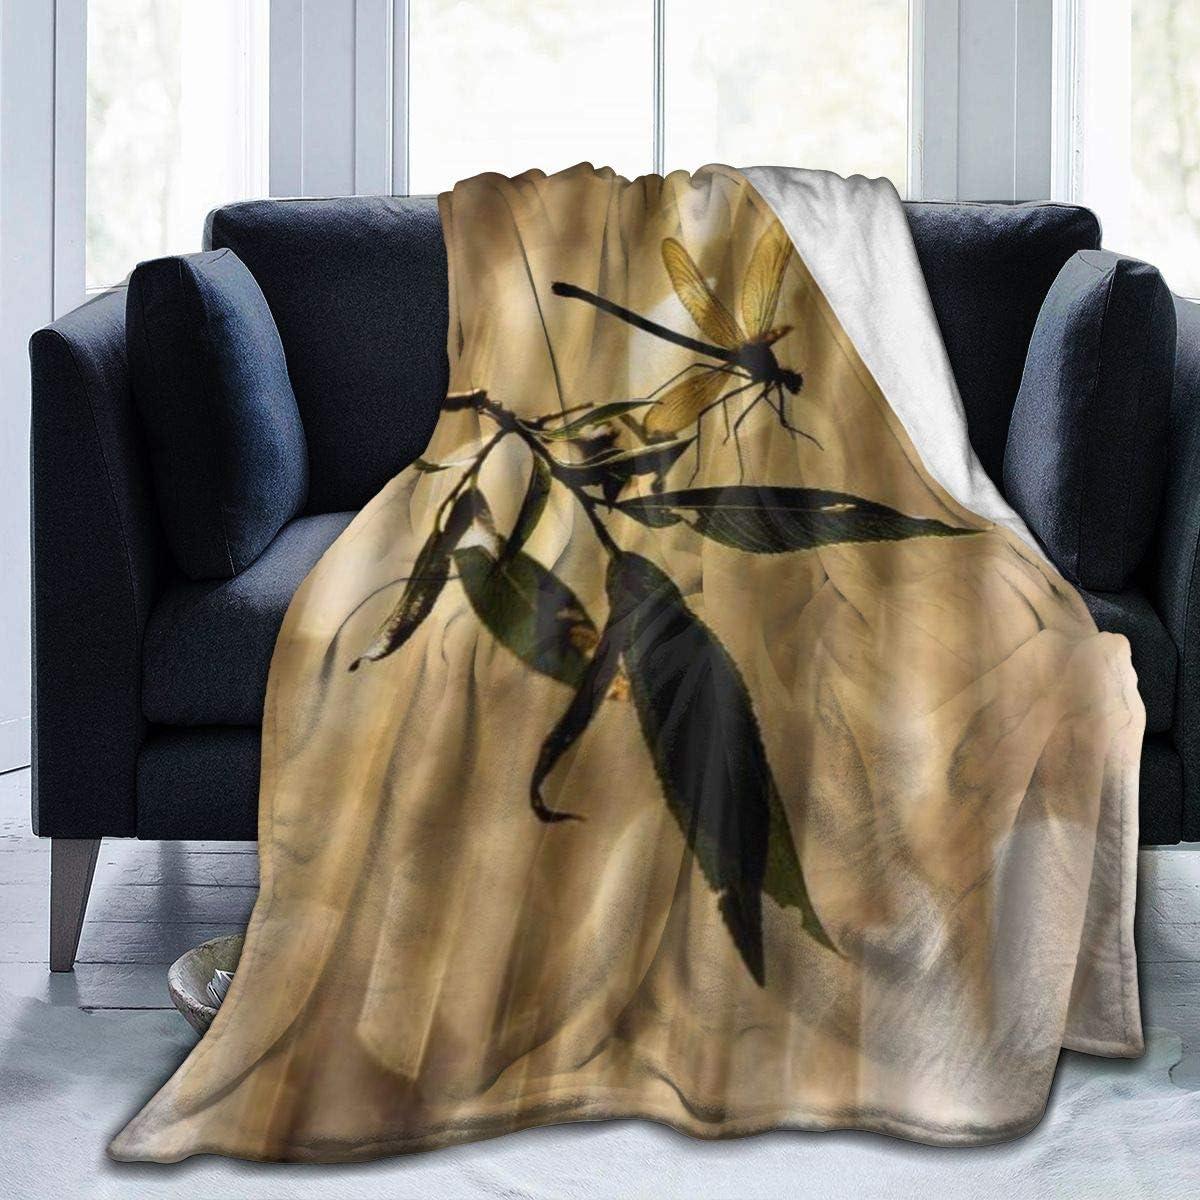 WINCAN Soft Fleece Throw Blanket,Libellule Blink Sunlight Design,Home Hotel Sofá Cama Sofá Mantas para Parejas Niños Adultos,120x150cm